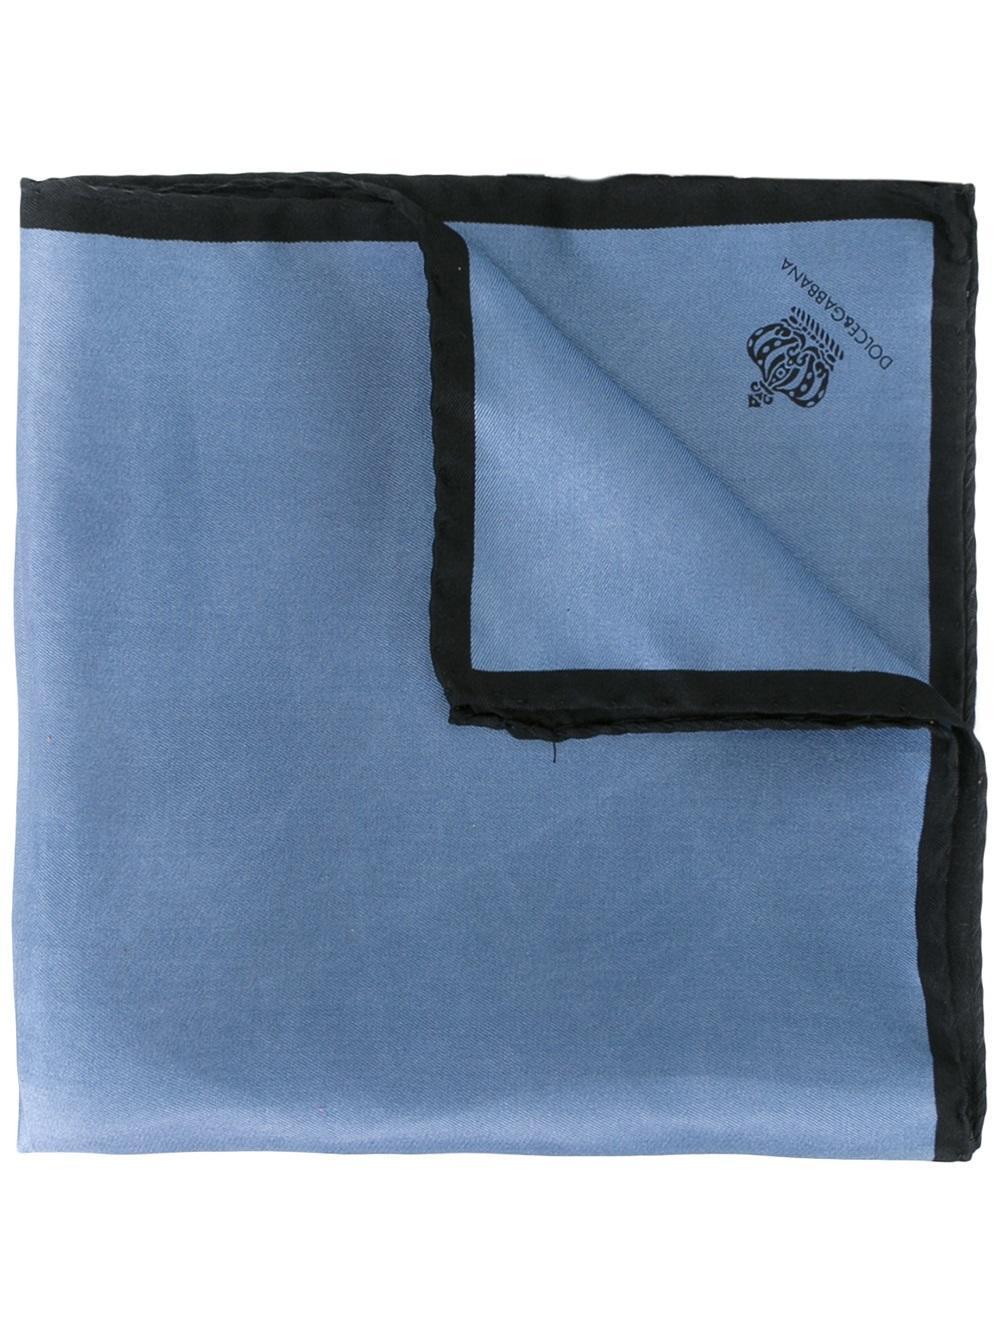 crown print pocket square - Blue Dolce & Gabbana 9huDDr